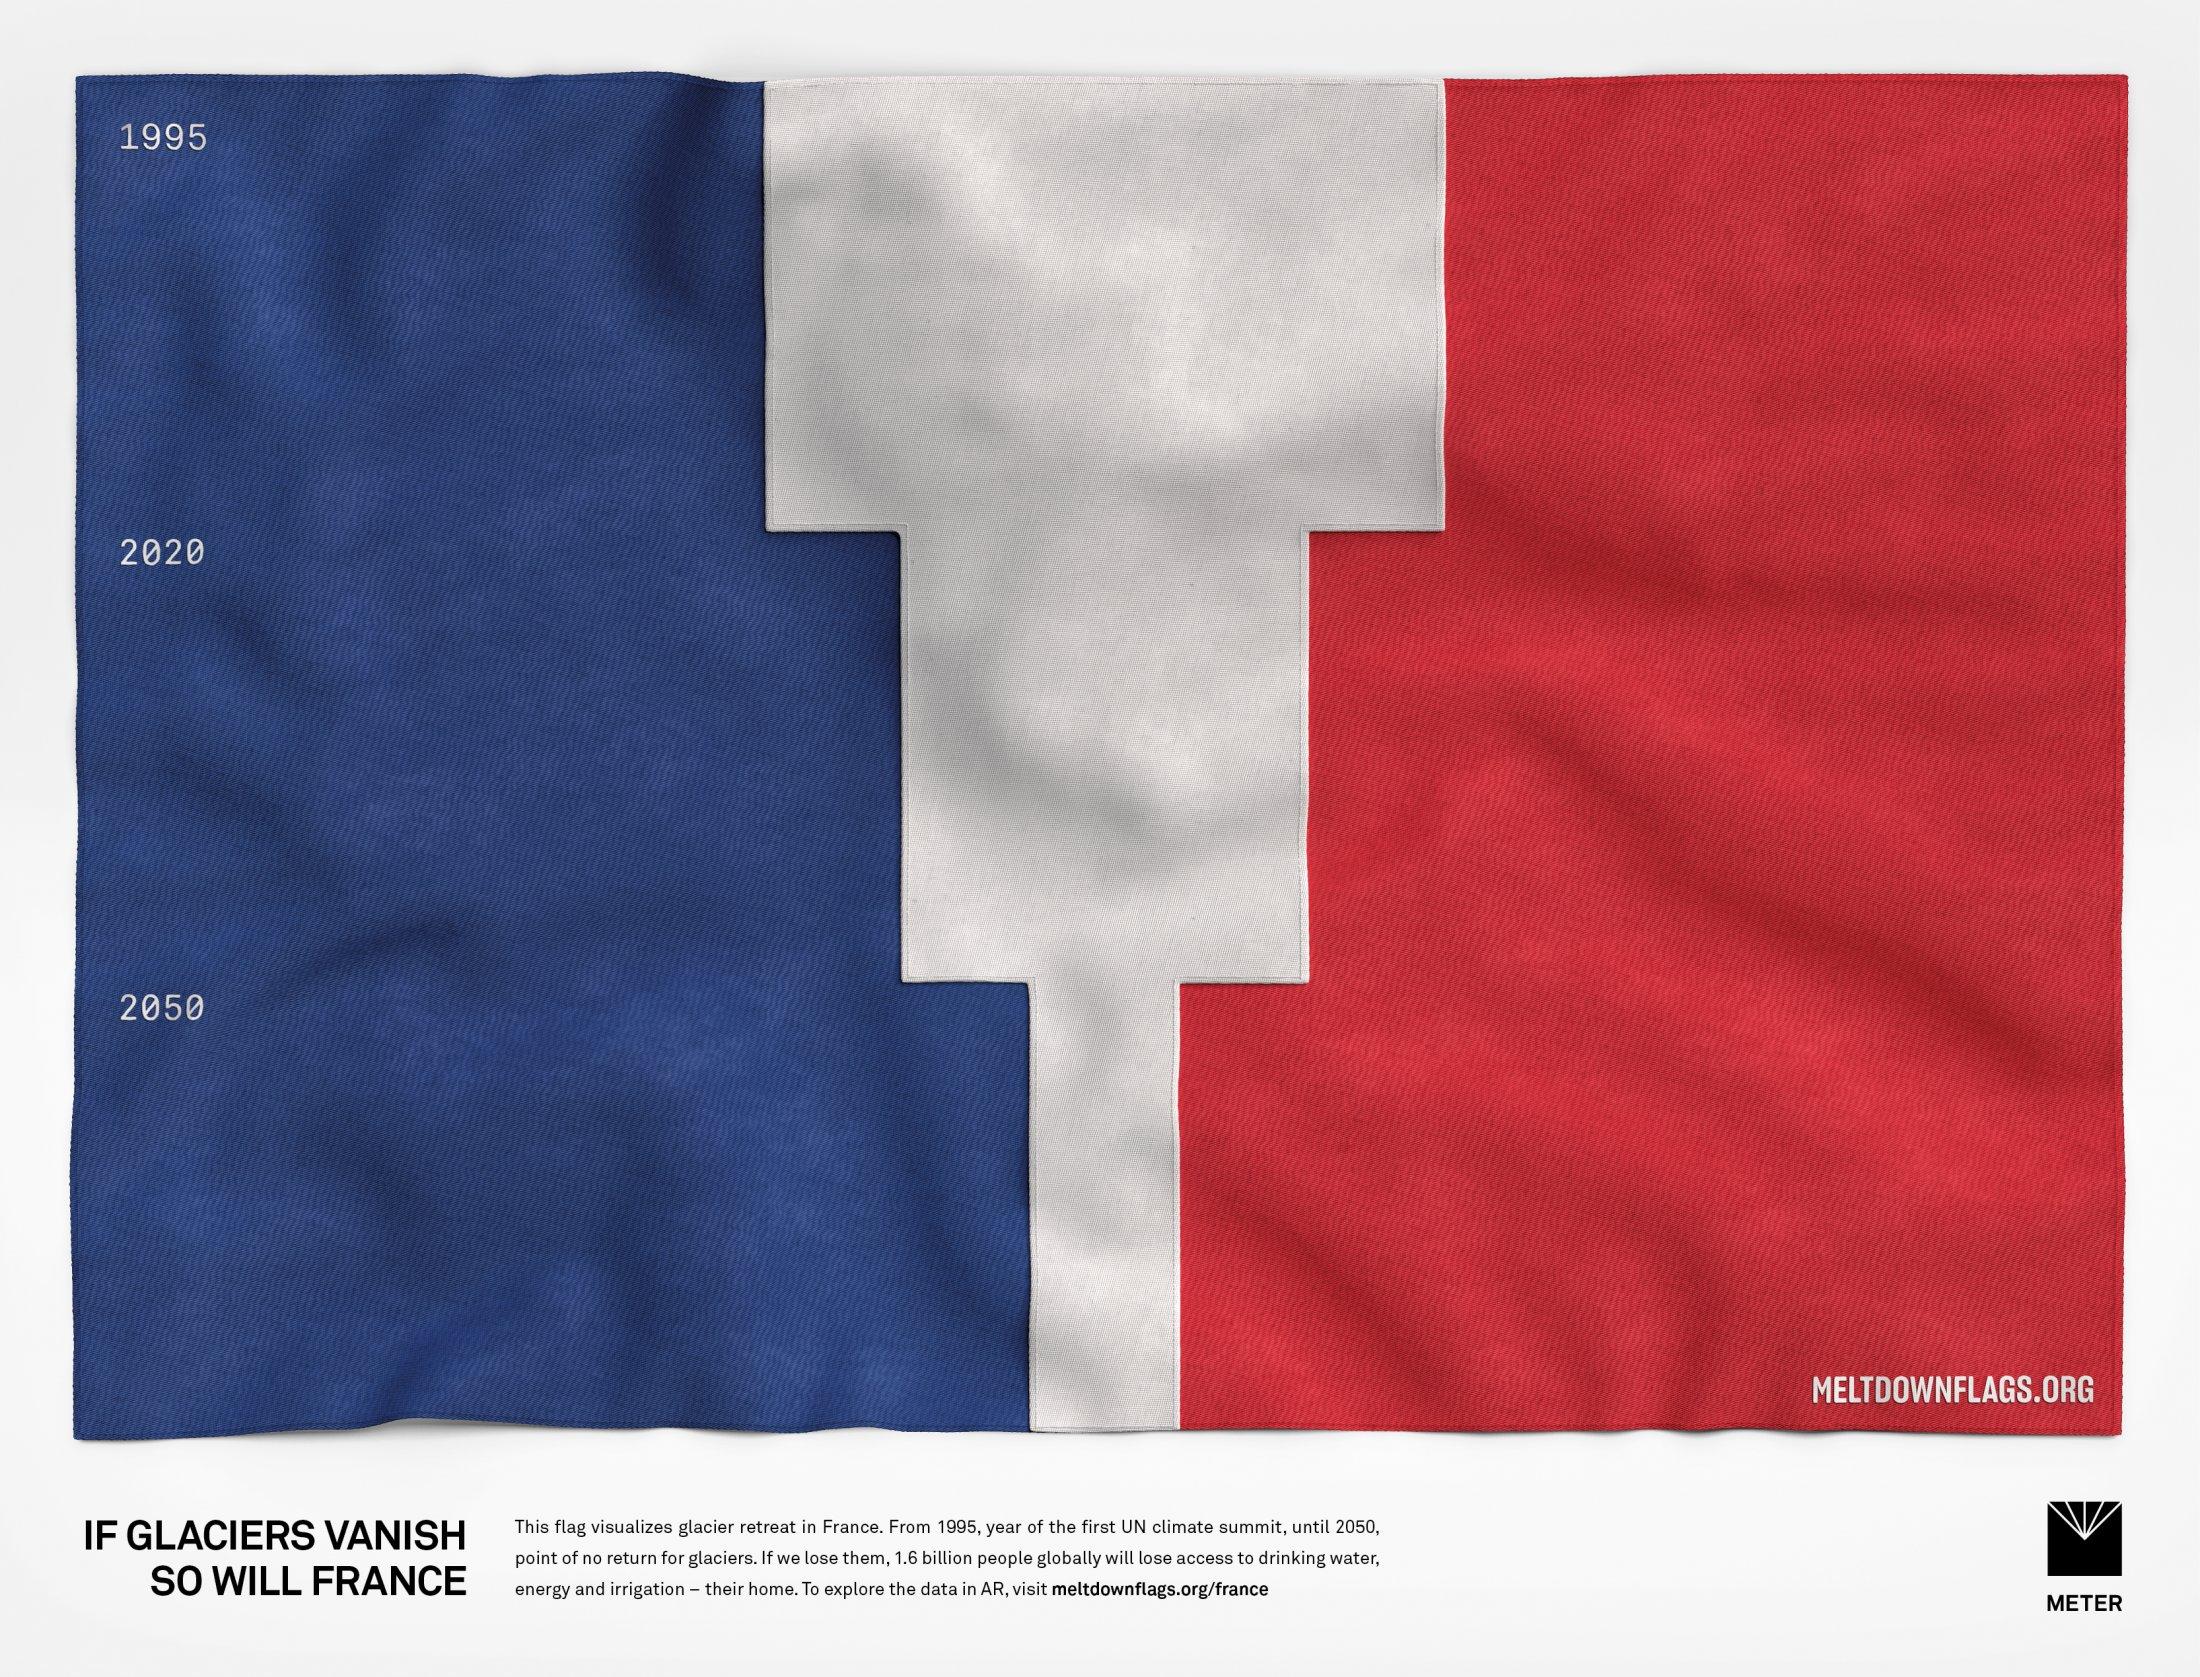 Thumbnail for Meltdown Flags